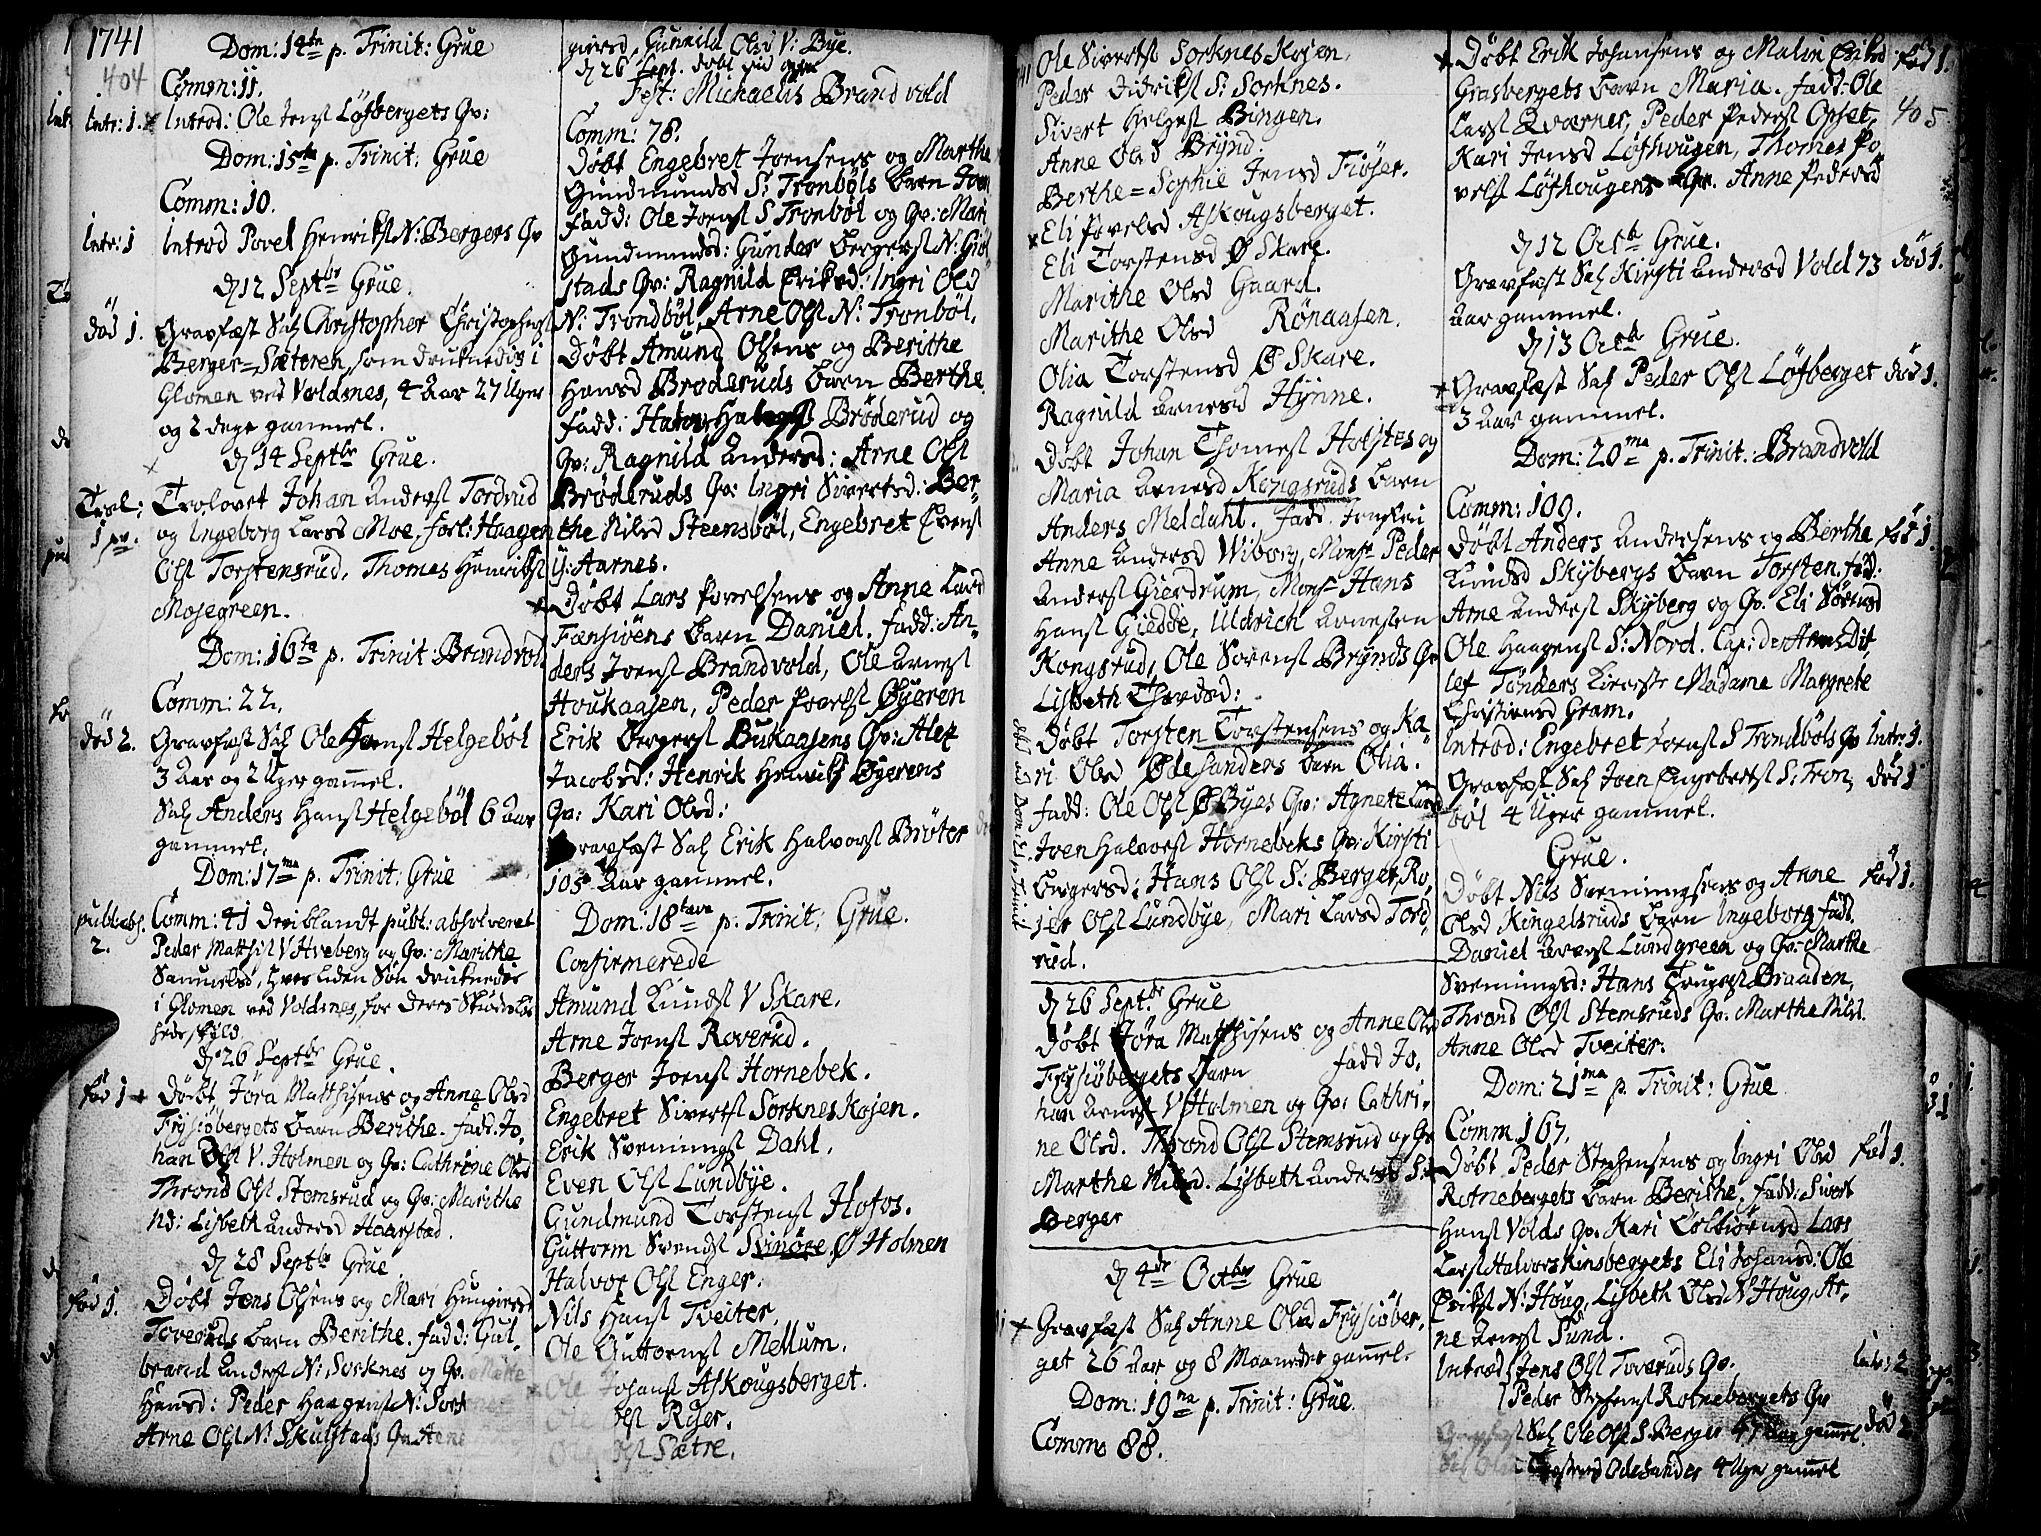 SAH, Grue prestekontor, Ministerialbok nr. 1, 1712-1748, s. 404-405